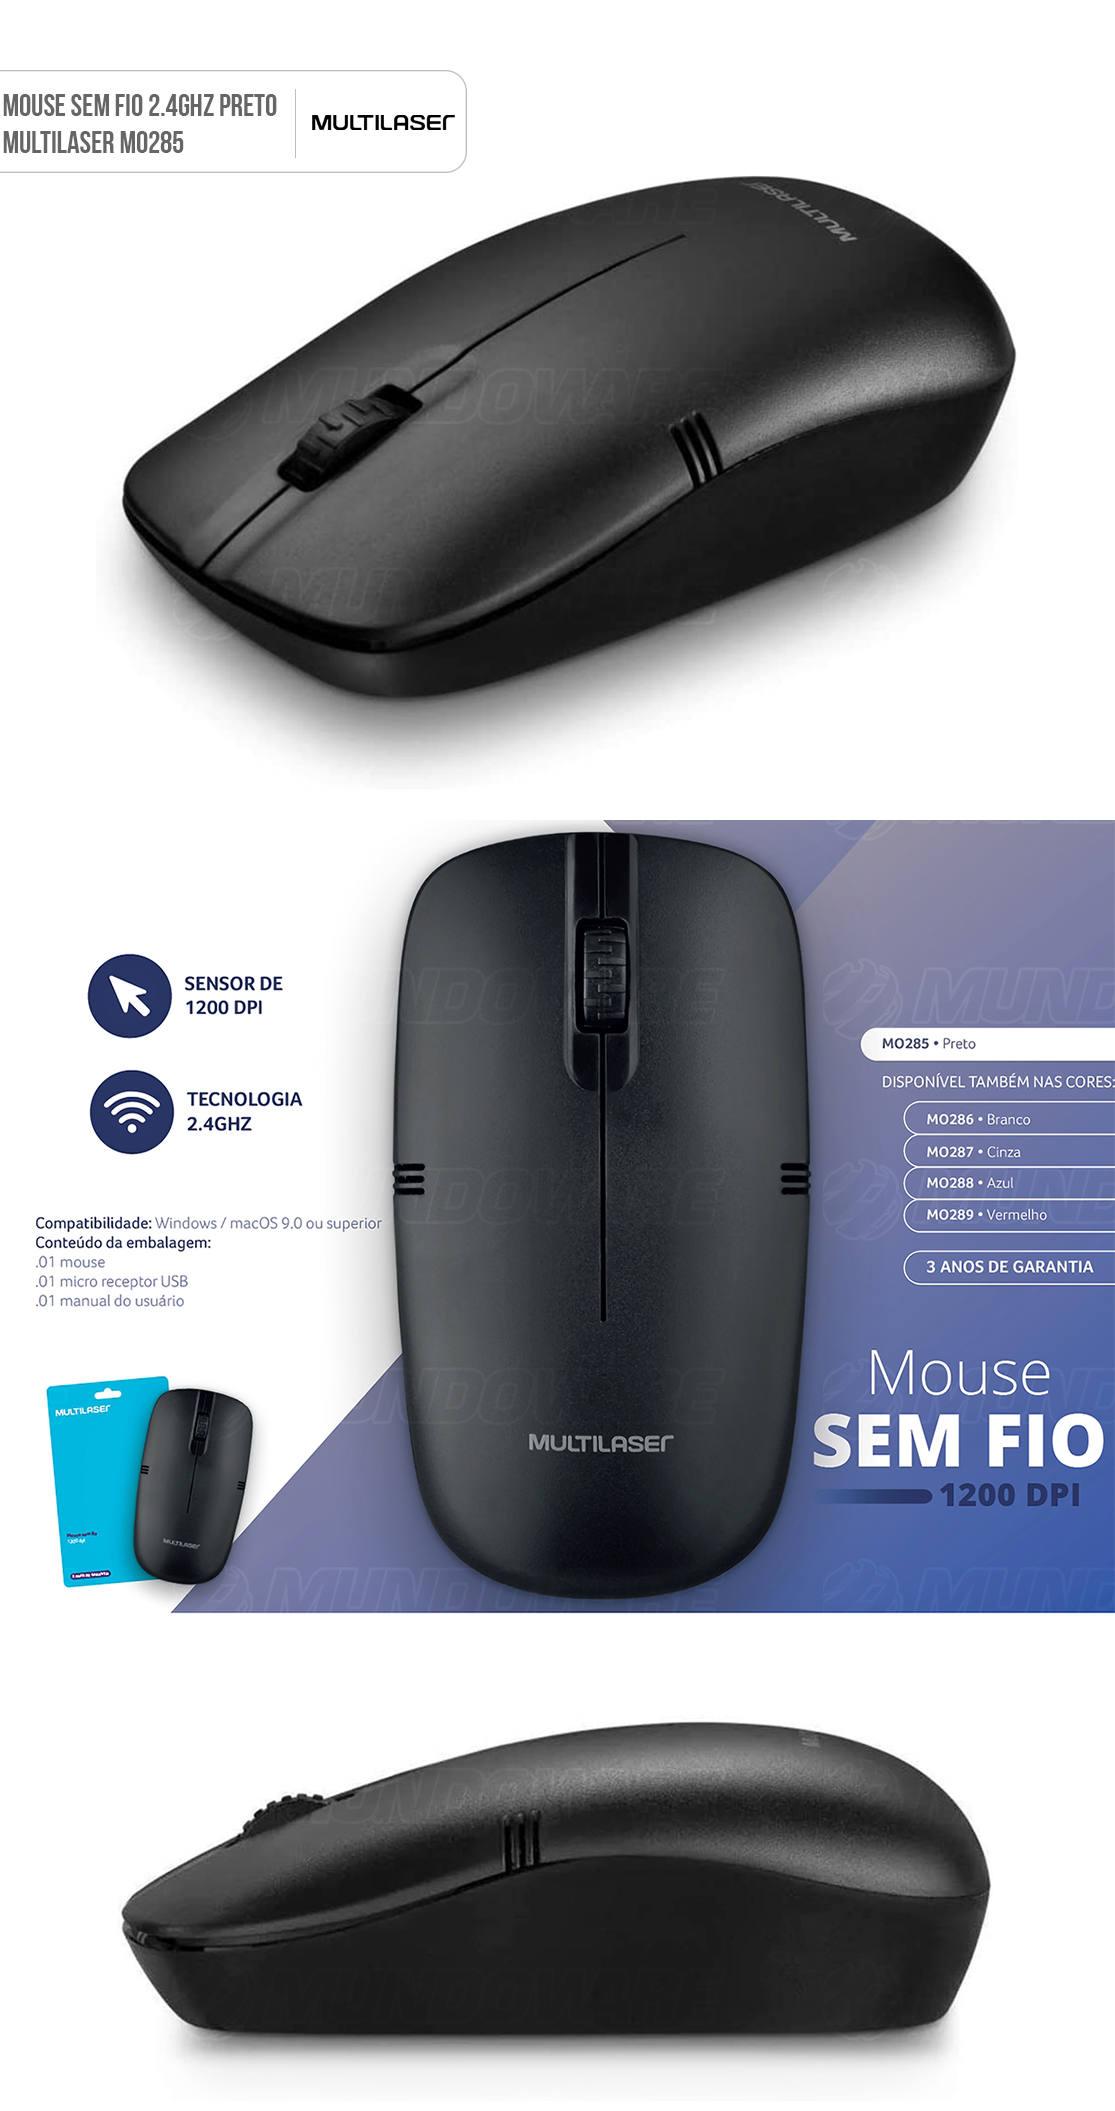 Mouse Sem Fio 1200DPI 2.4GHZ USB Preto Multilaser MO285